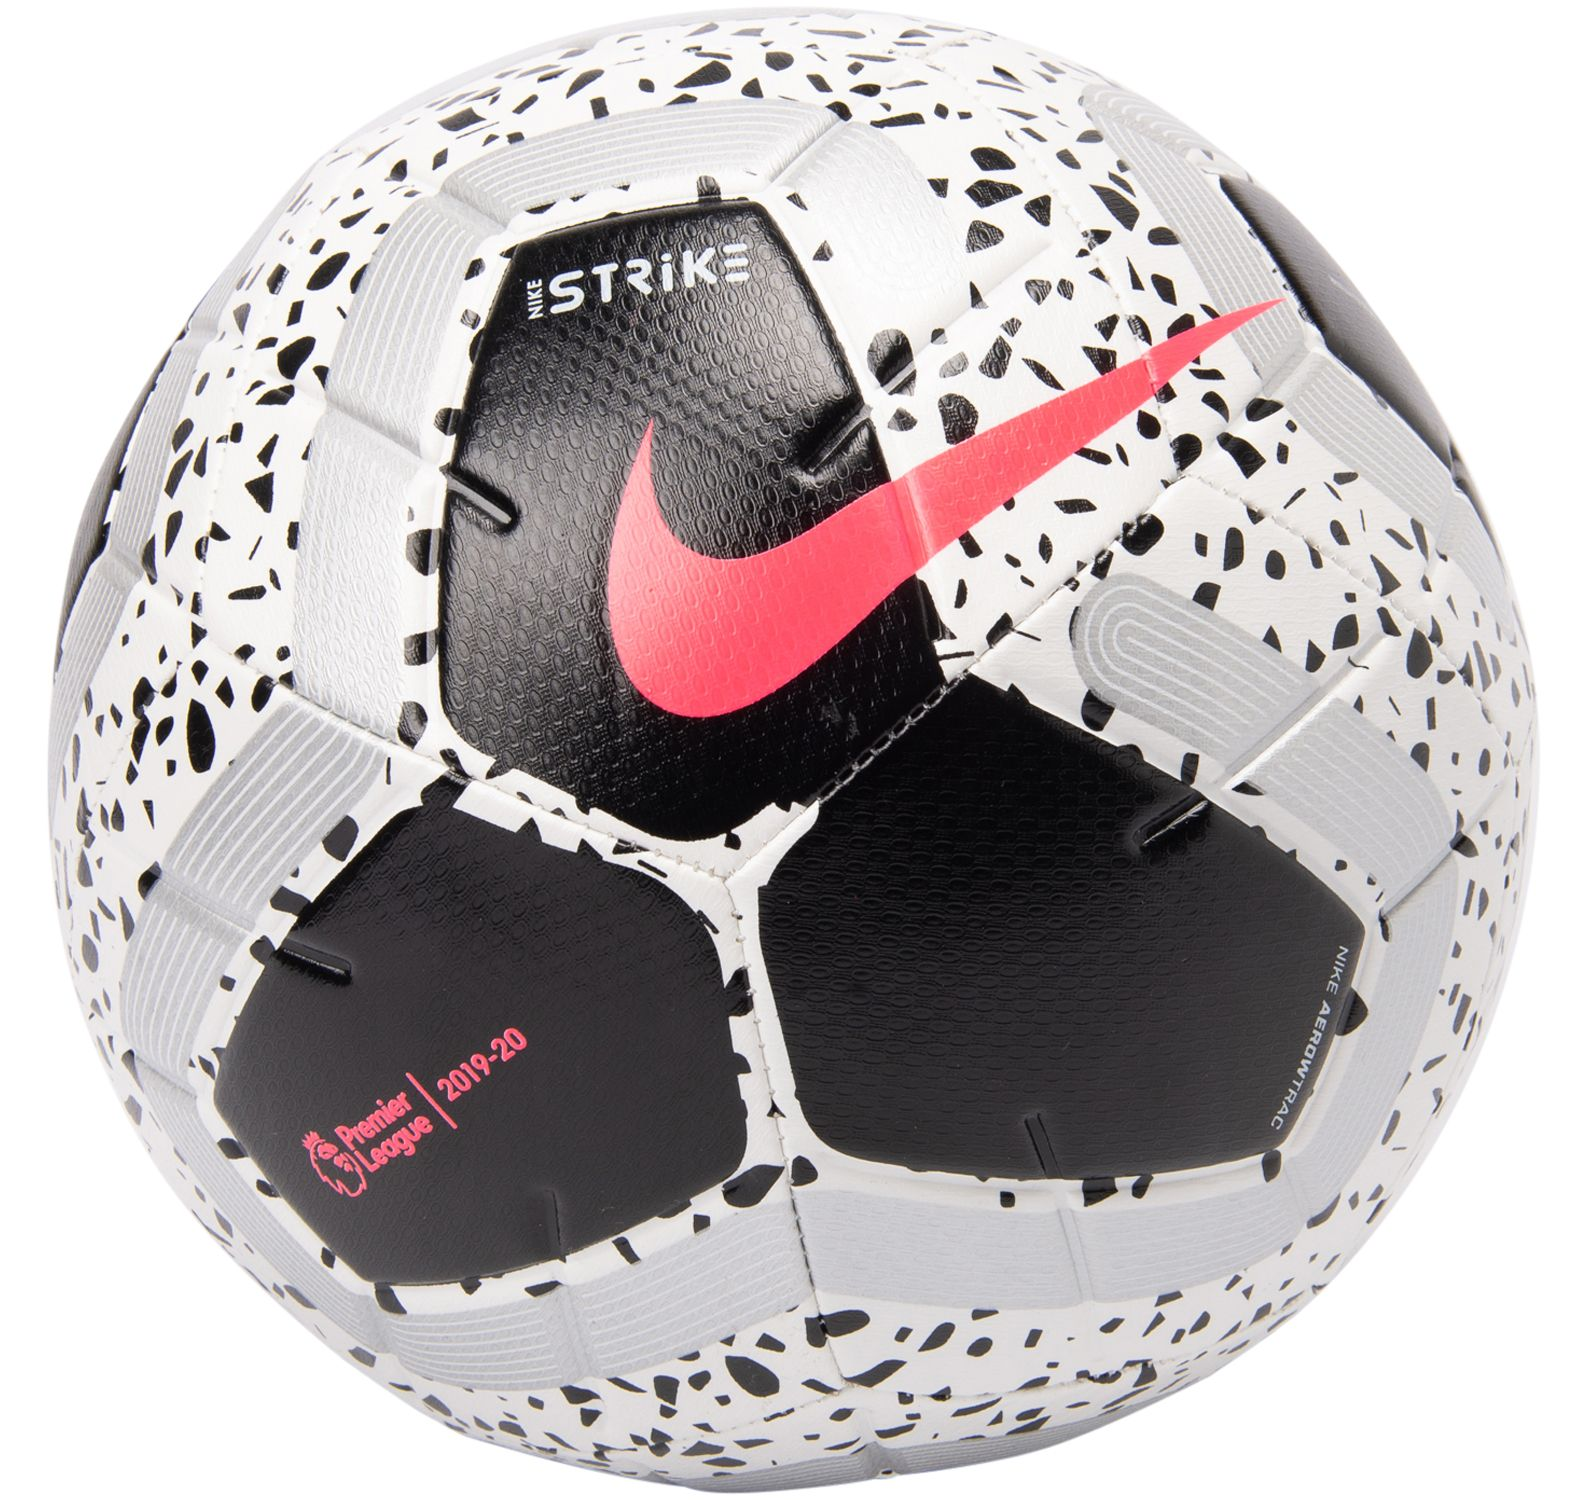 Premier League Strike Soccer B, White/Black/Black/Racer Pink, 3,  Nike